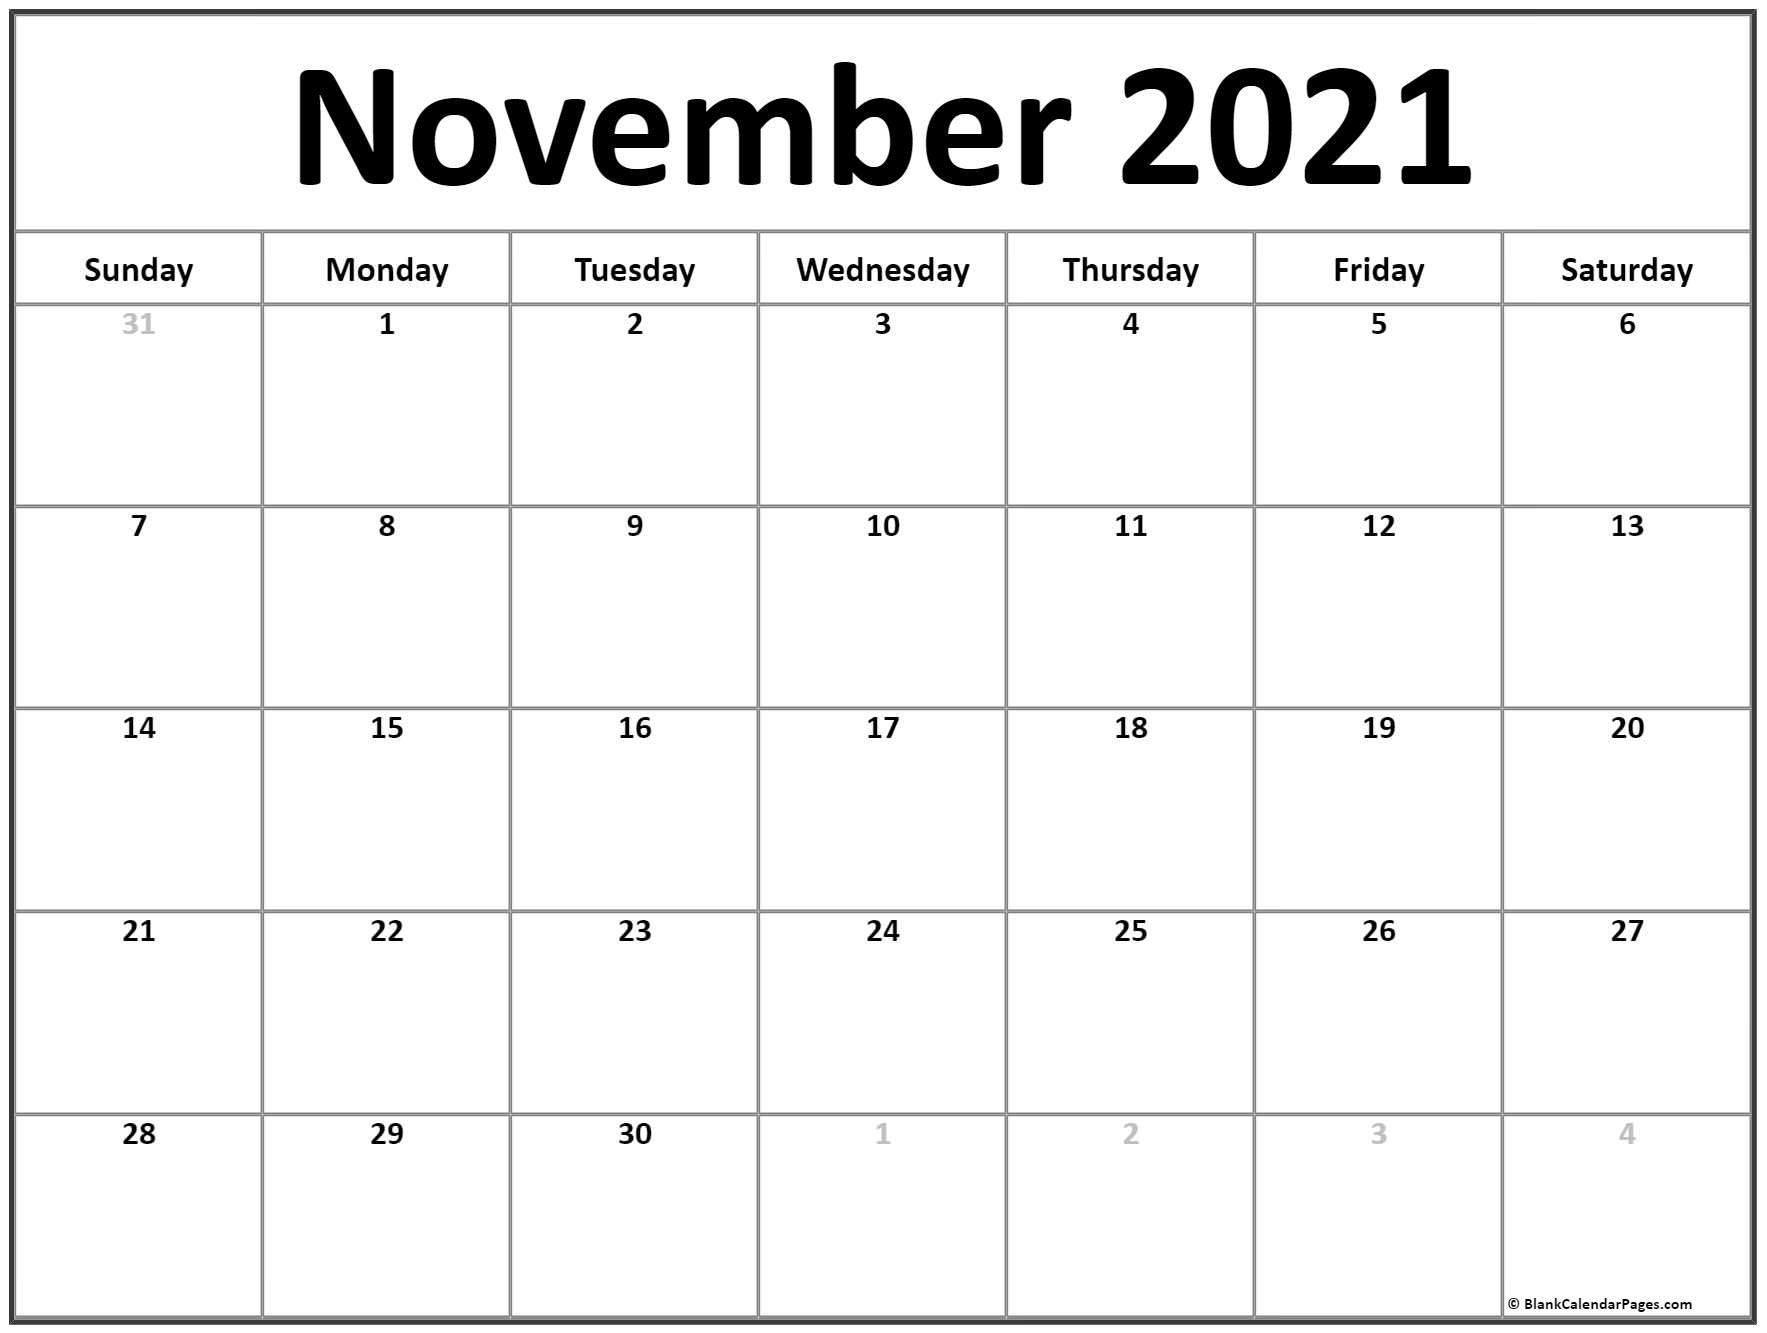 Get November 2021 Printable Calendar Sheet